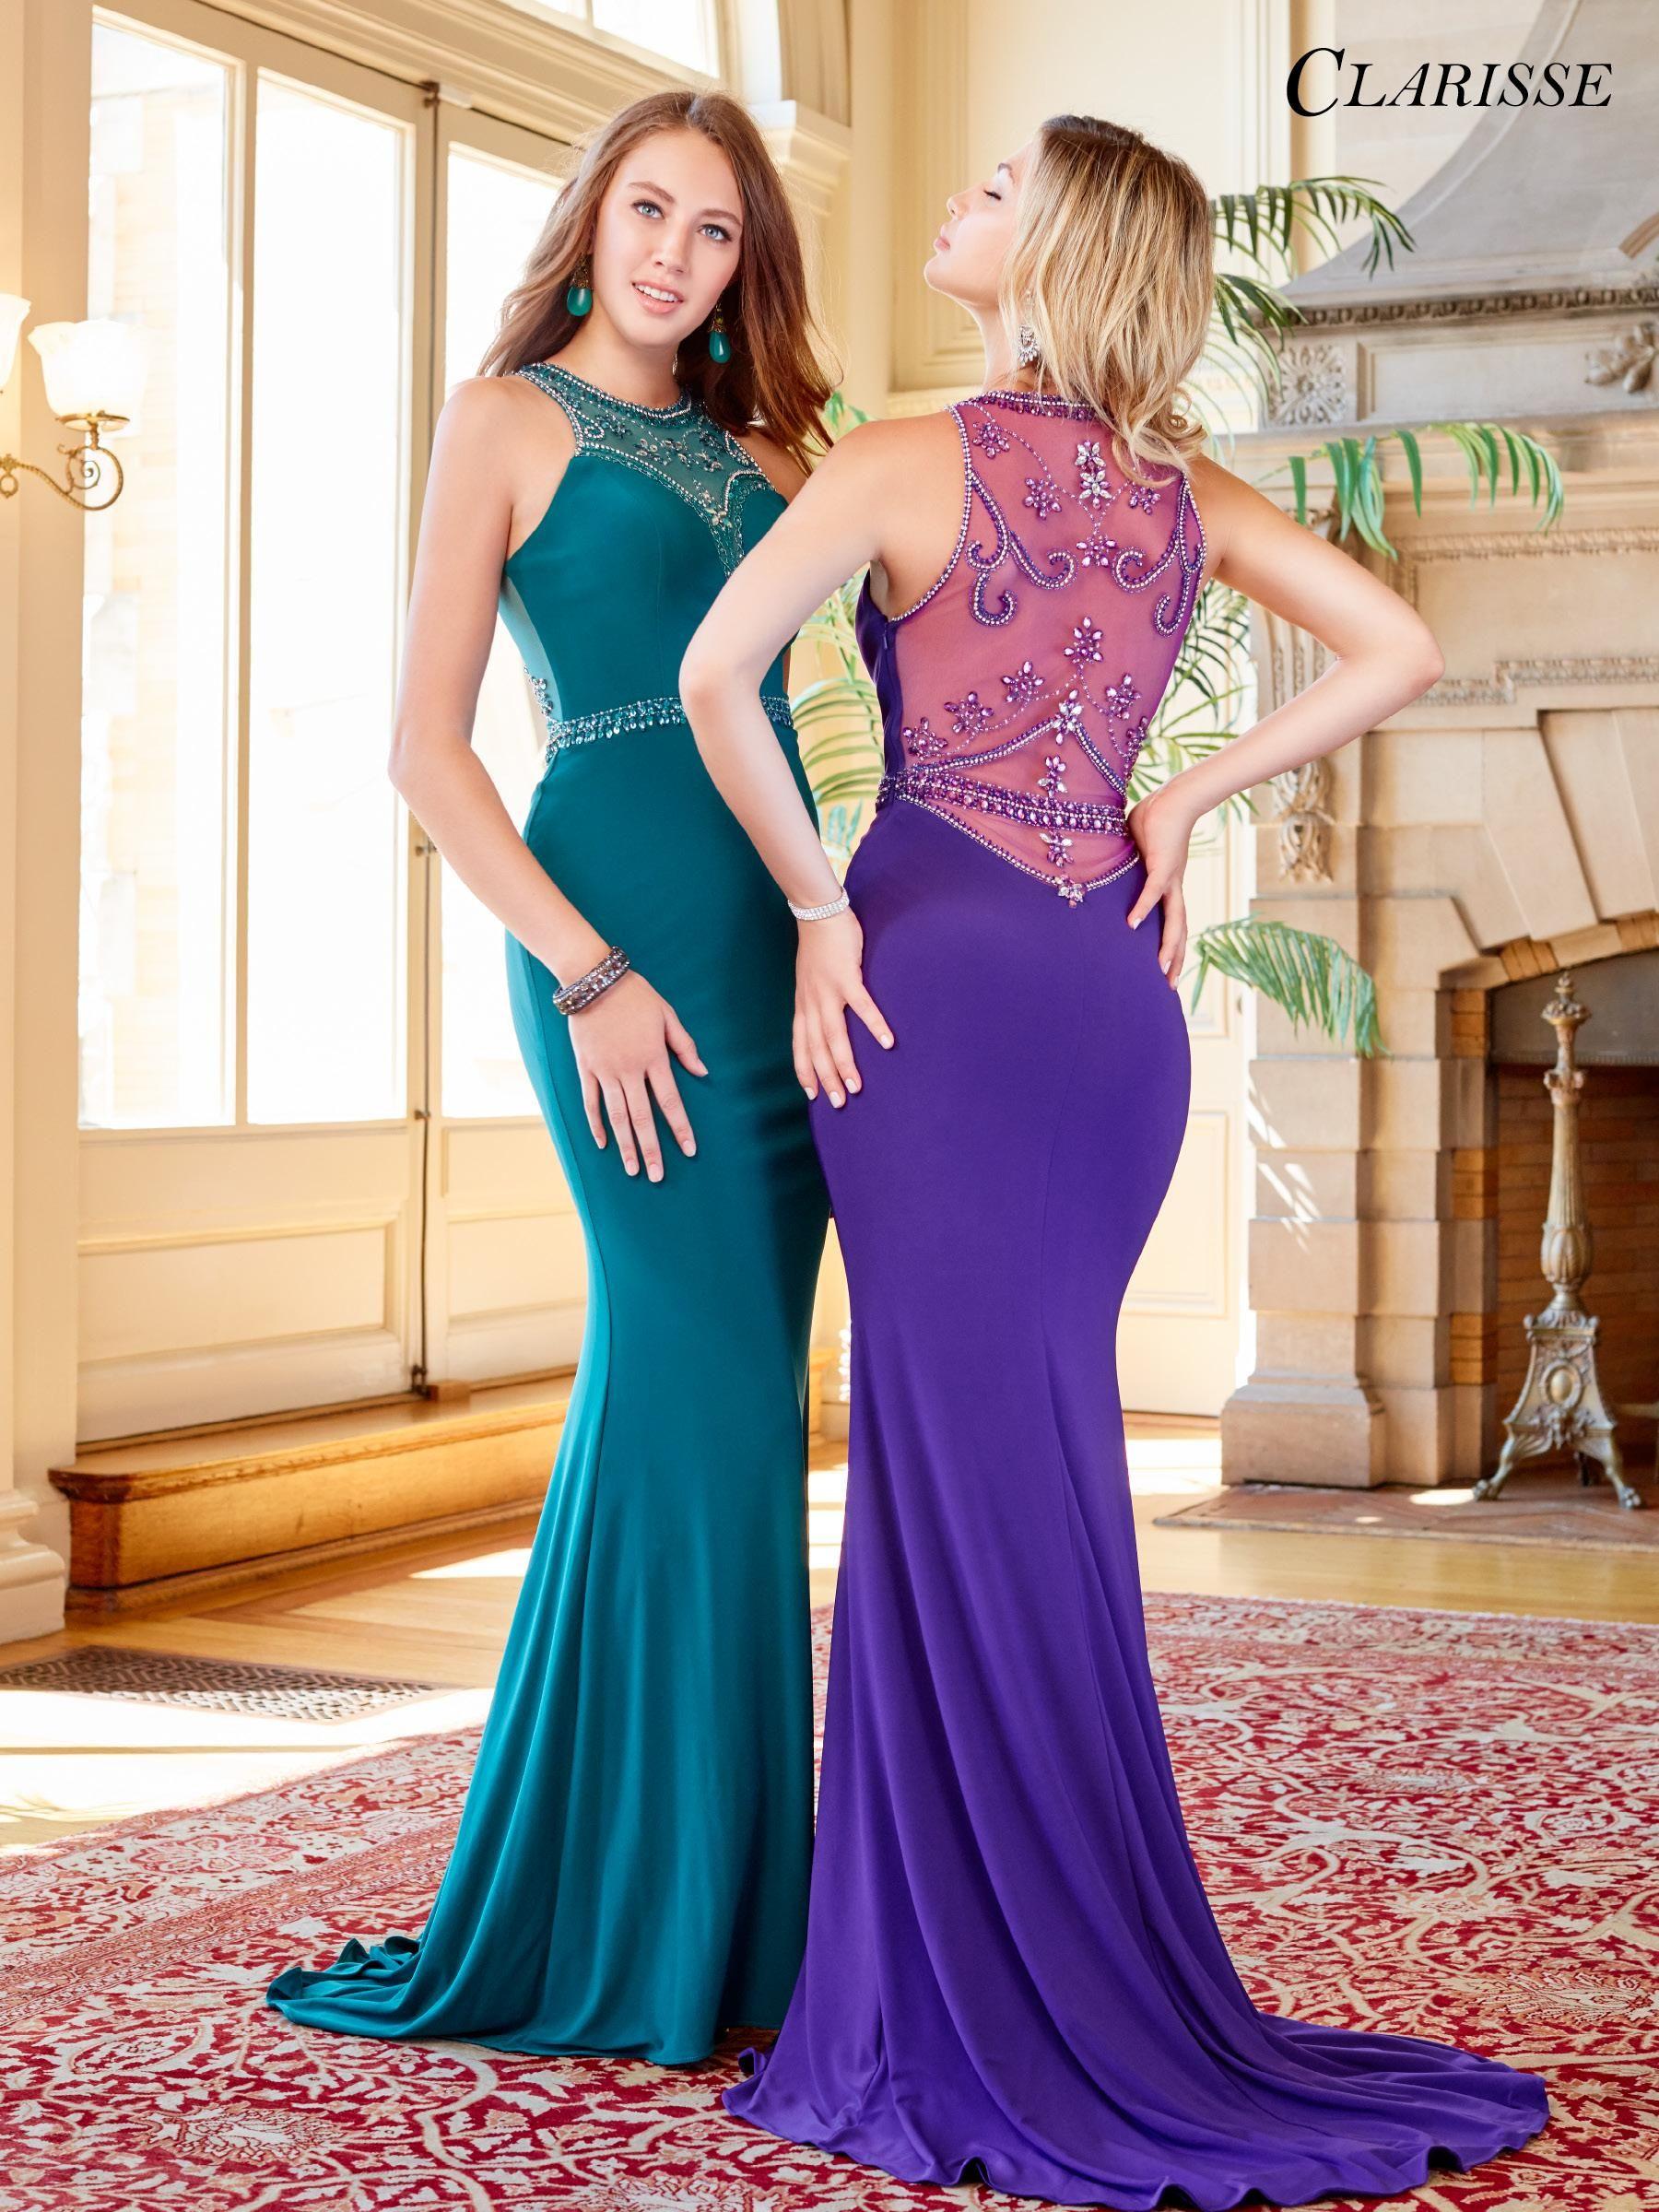 Style 3511 #Purple Size 4 #Clarisse #BridesBouquet #Prom #Prom2018 ...